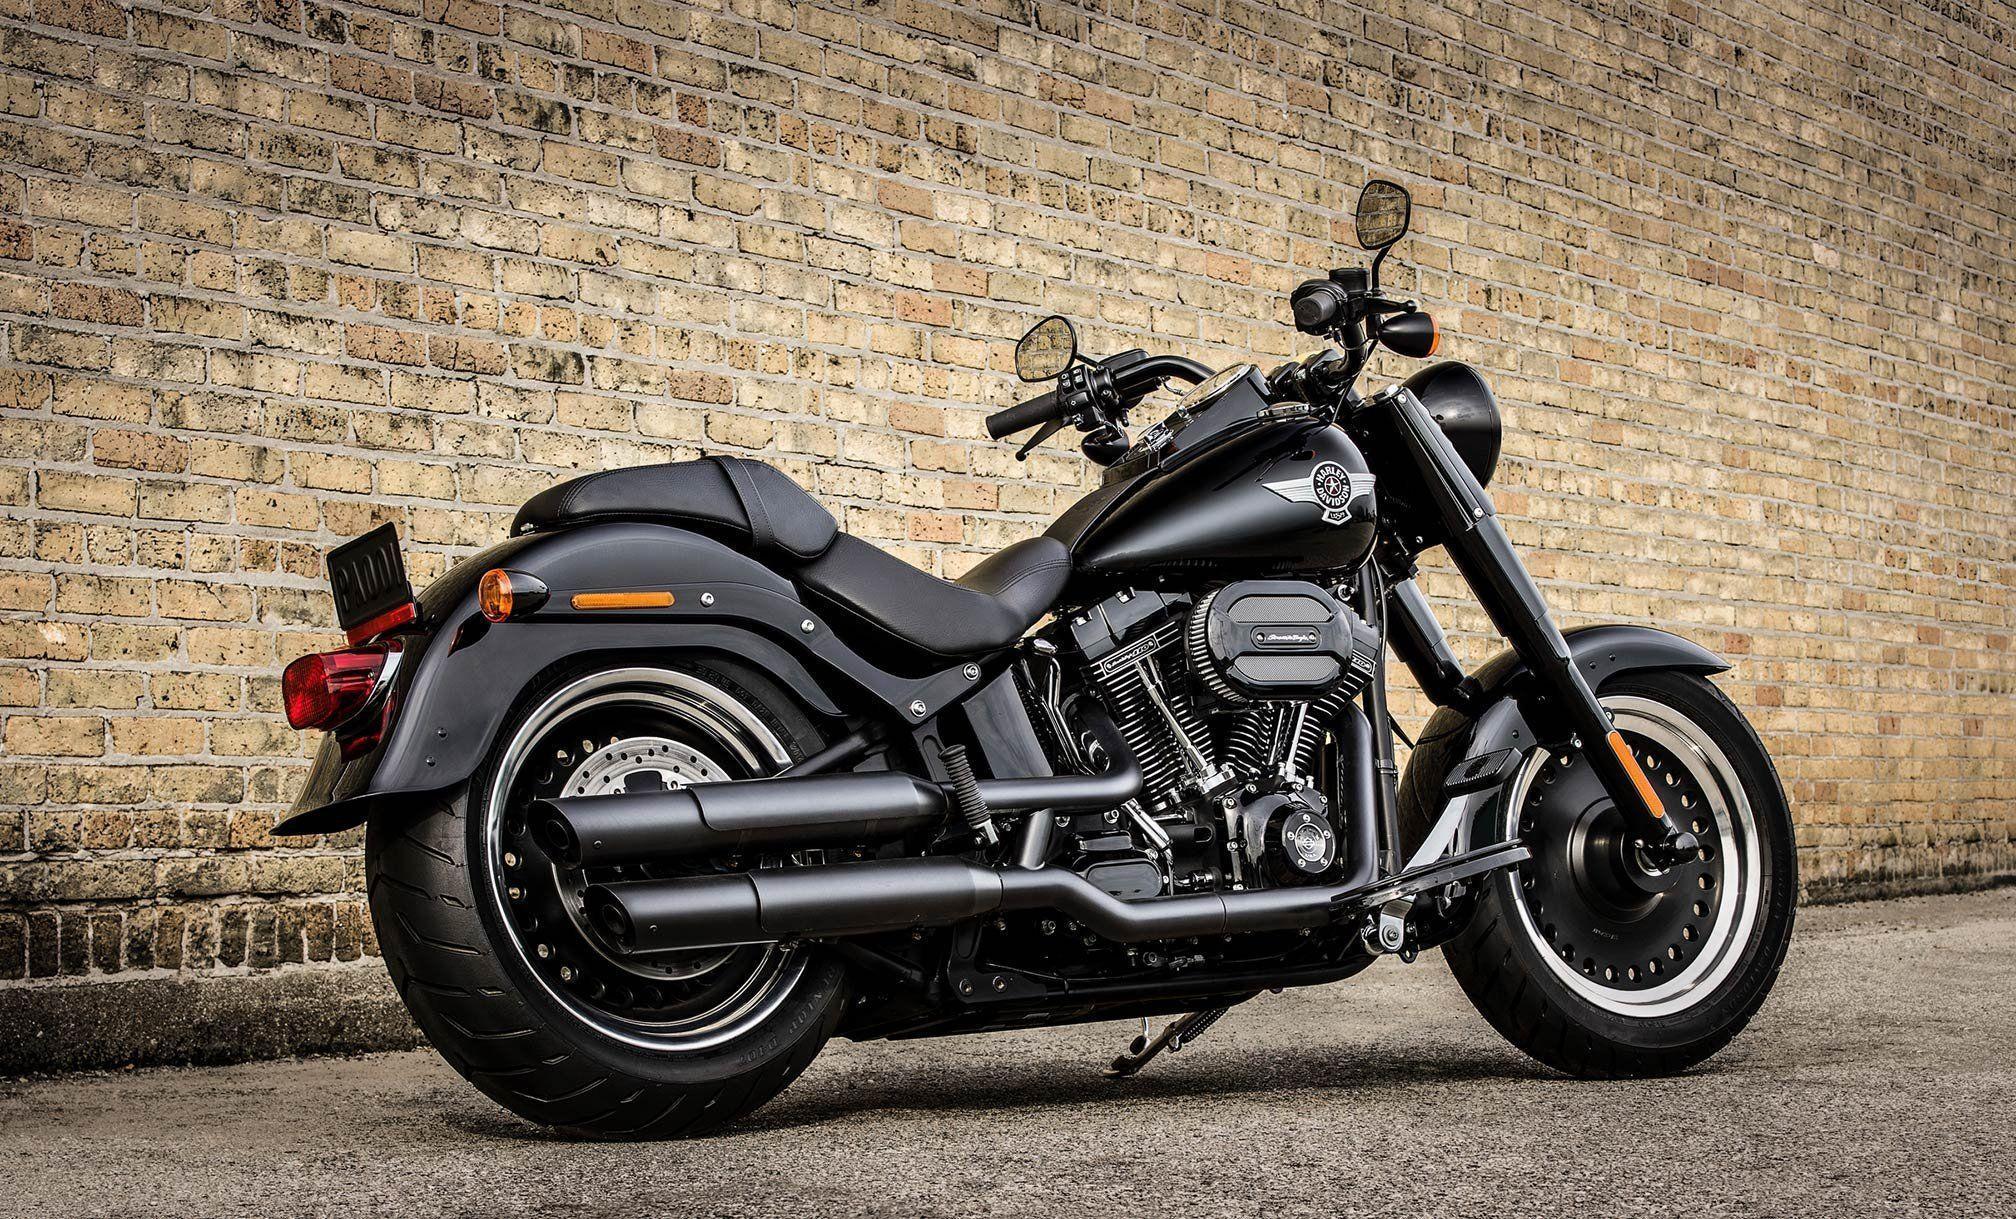 2016 Harley Davidson Fat Boy S Fat Custom motorbike bike ...